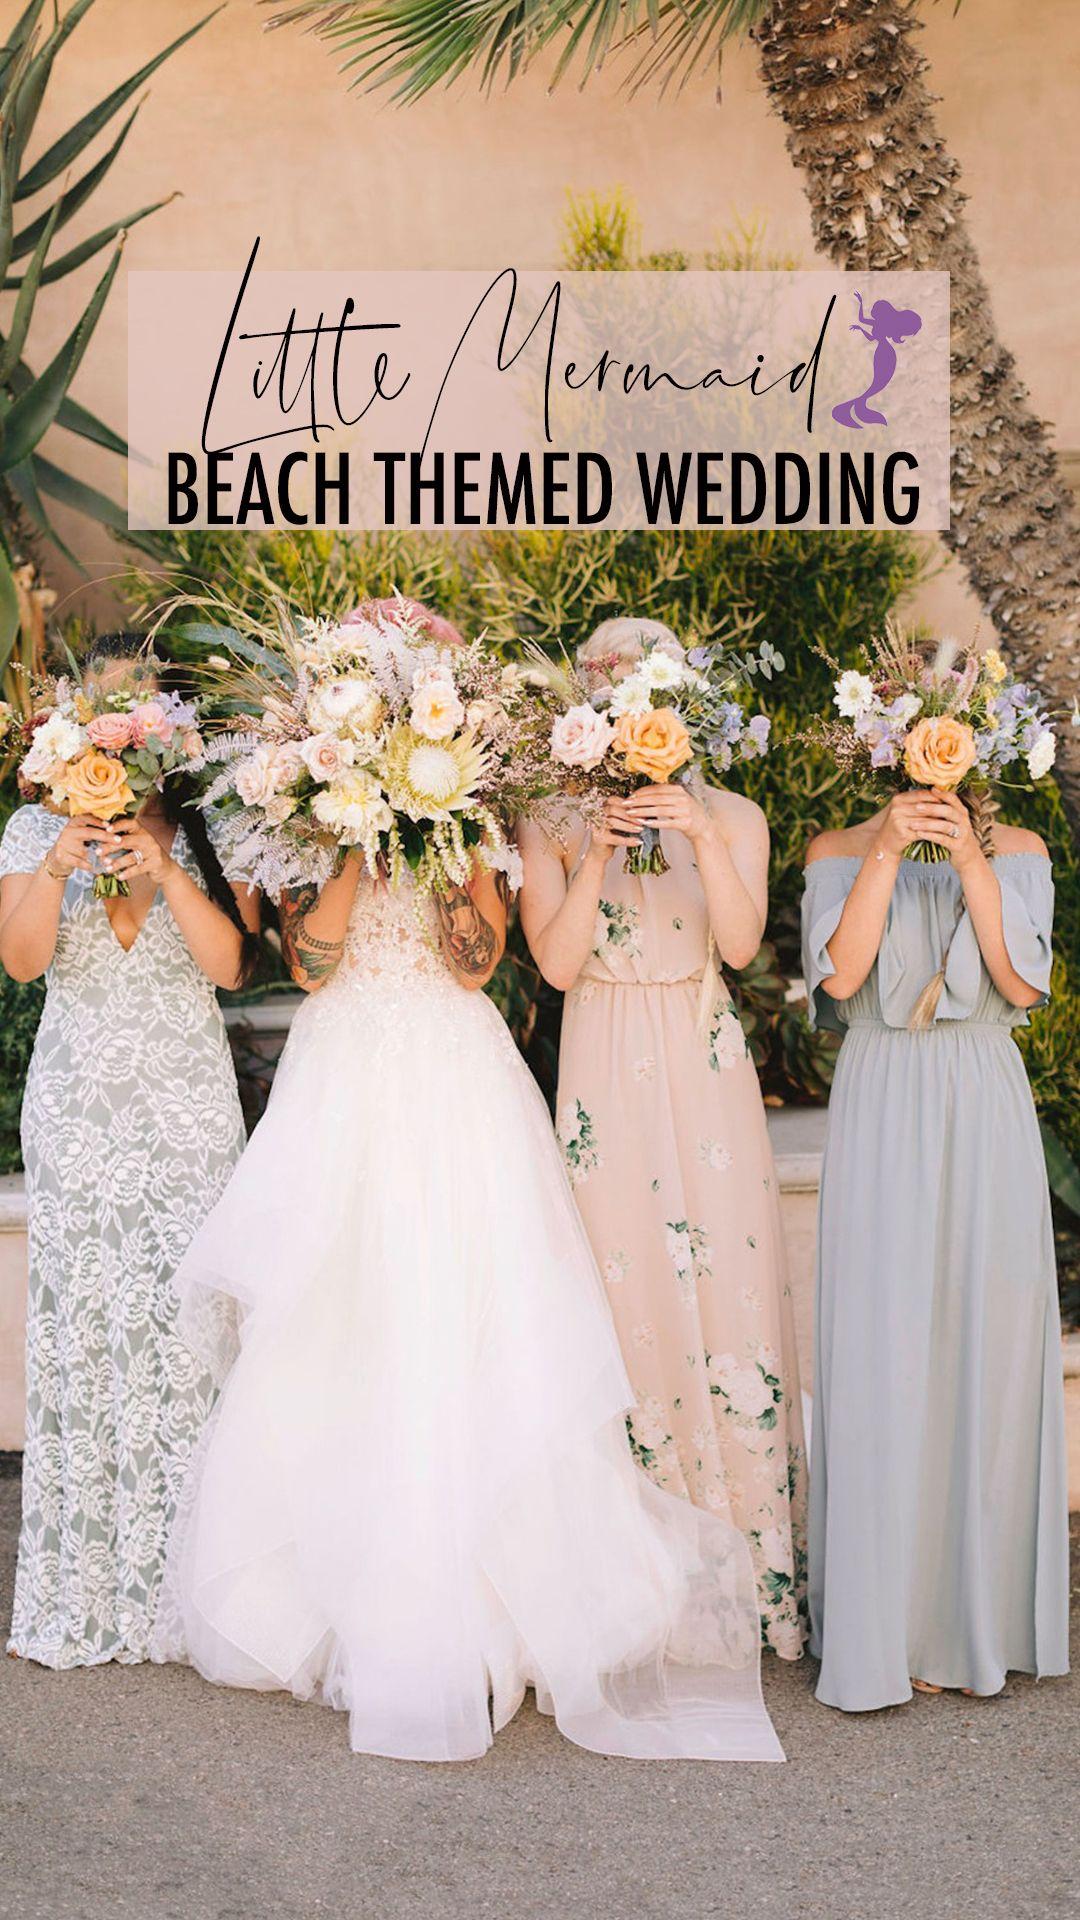 Little Mermaid Beach Themed Wedding Ariel Wedding Theme Little Mermaid Wedding Beach Theme Wedding [ 1920 x 1080 Pixel ]